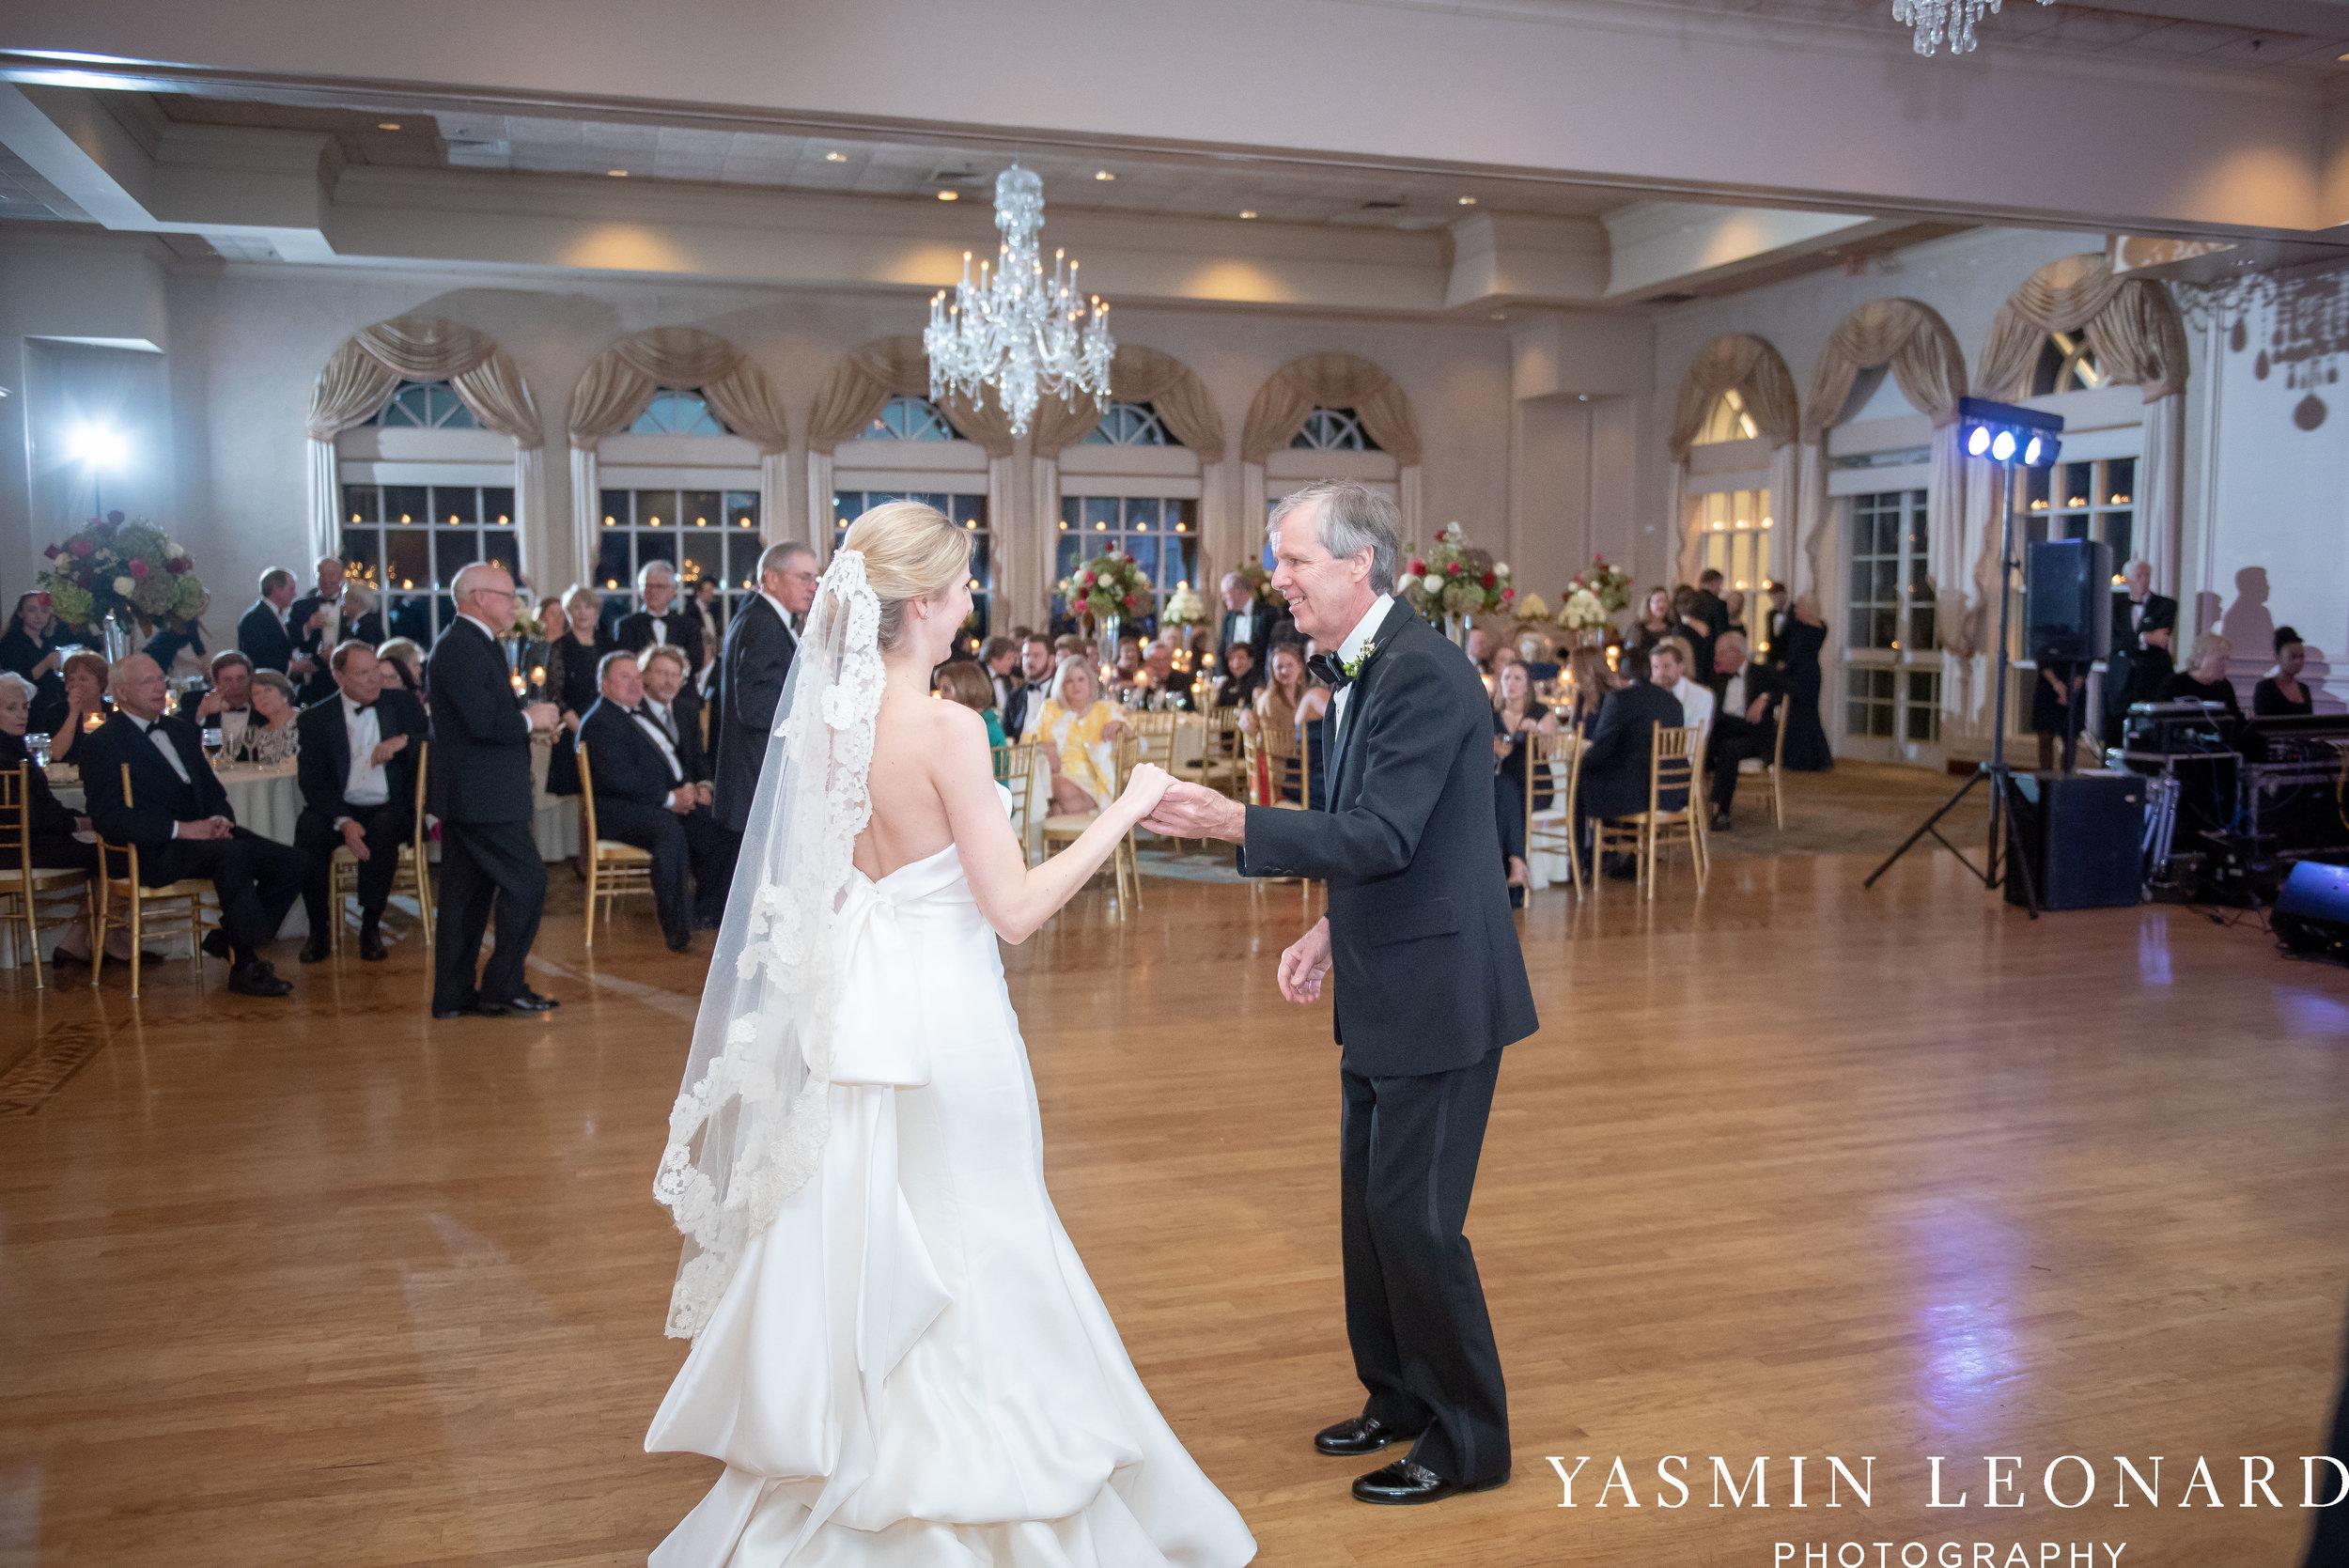 Wesley Memorial UMC - High Point Country Club - Emerywood Country Club - High Point Weddings - High Point Wedding Photographer - Yasmin Leonard Photography-39.jpg